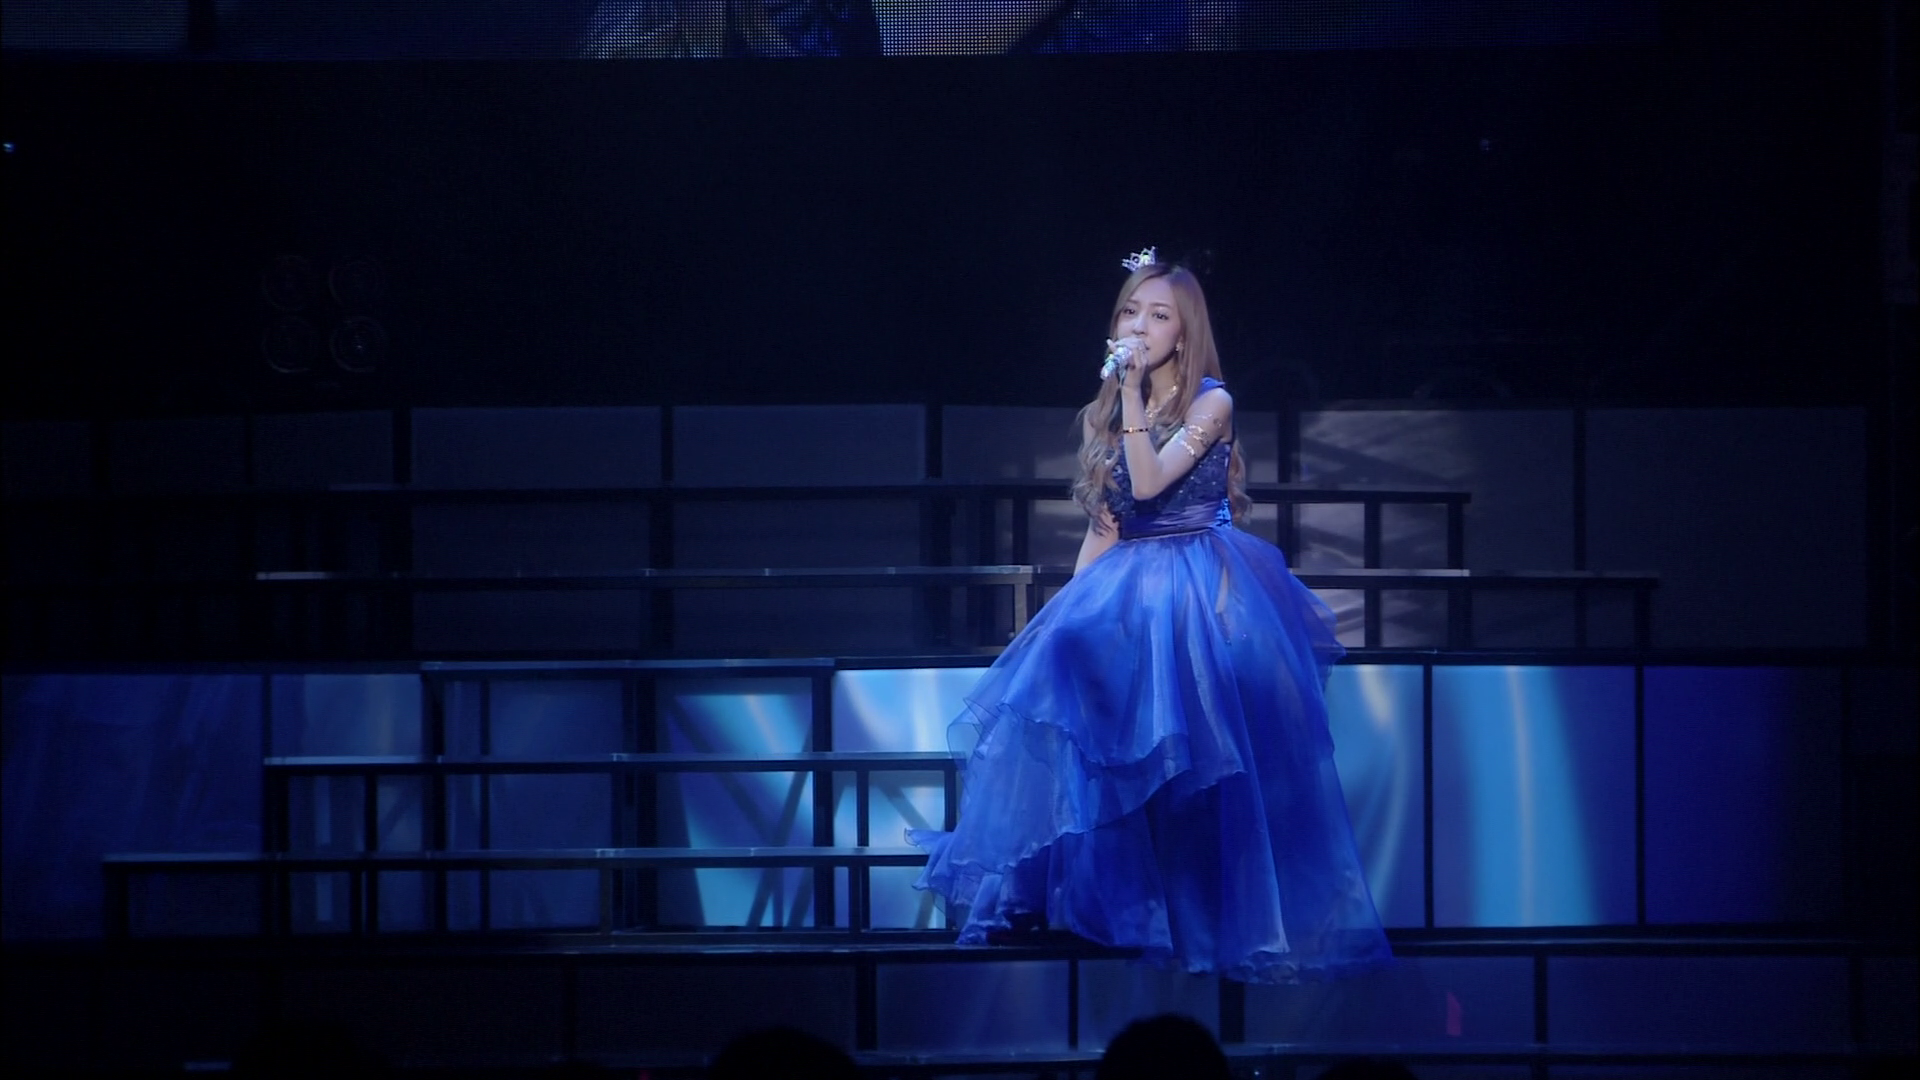 20171209.0704.2 Tomomi Itano - Live Tour ~SxWxAxG~ (Blu-Ray.iso) (JPOP.ru) 002.png